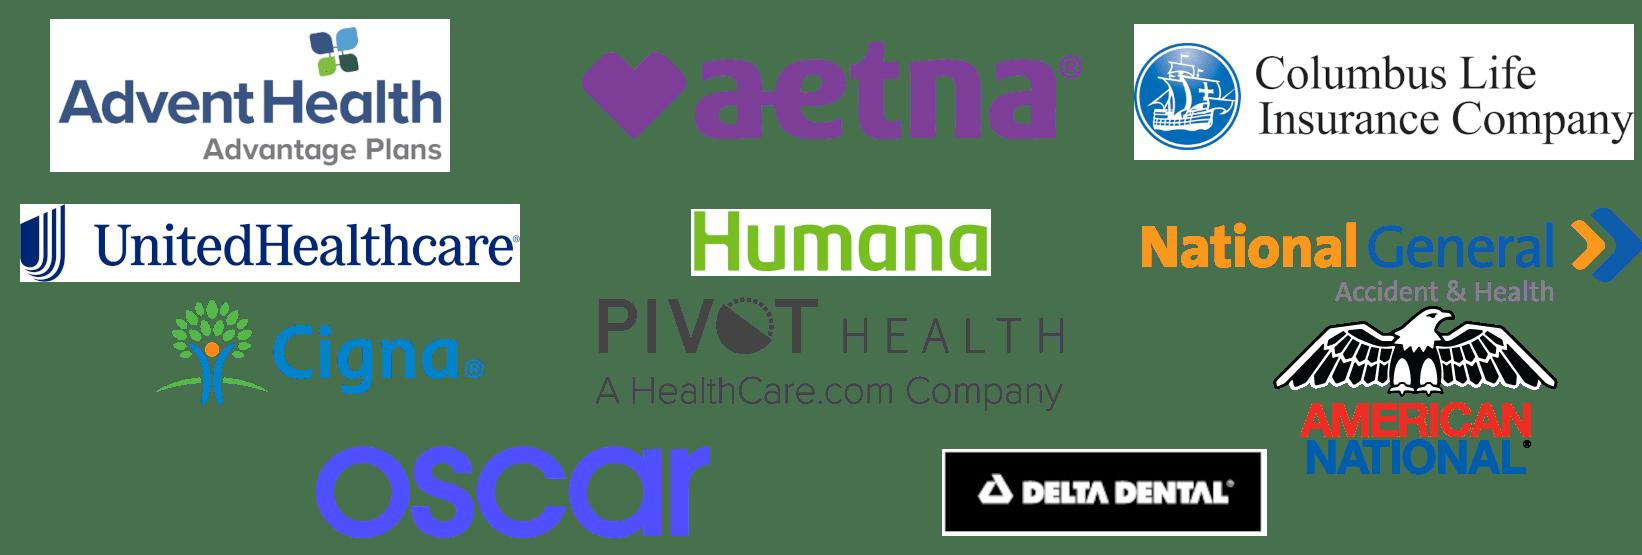 Health Insurance logos for advent health, aetna, columbus life, united health care, humana, national general, pivot health, cigna, oscar, american national and delta dental